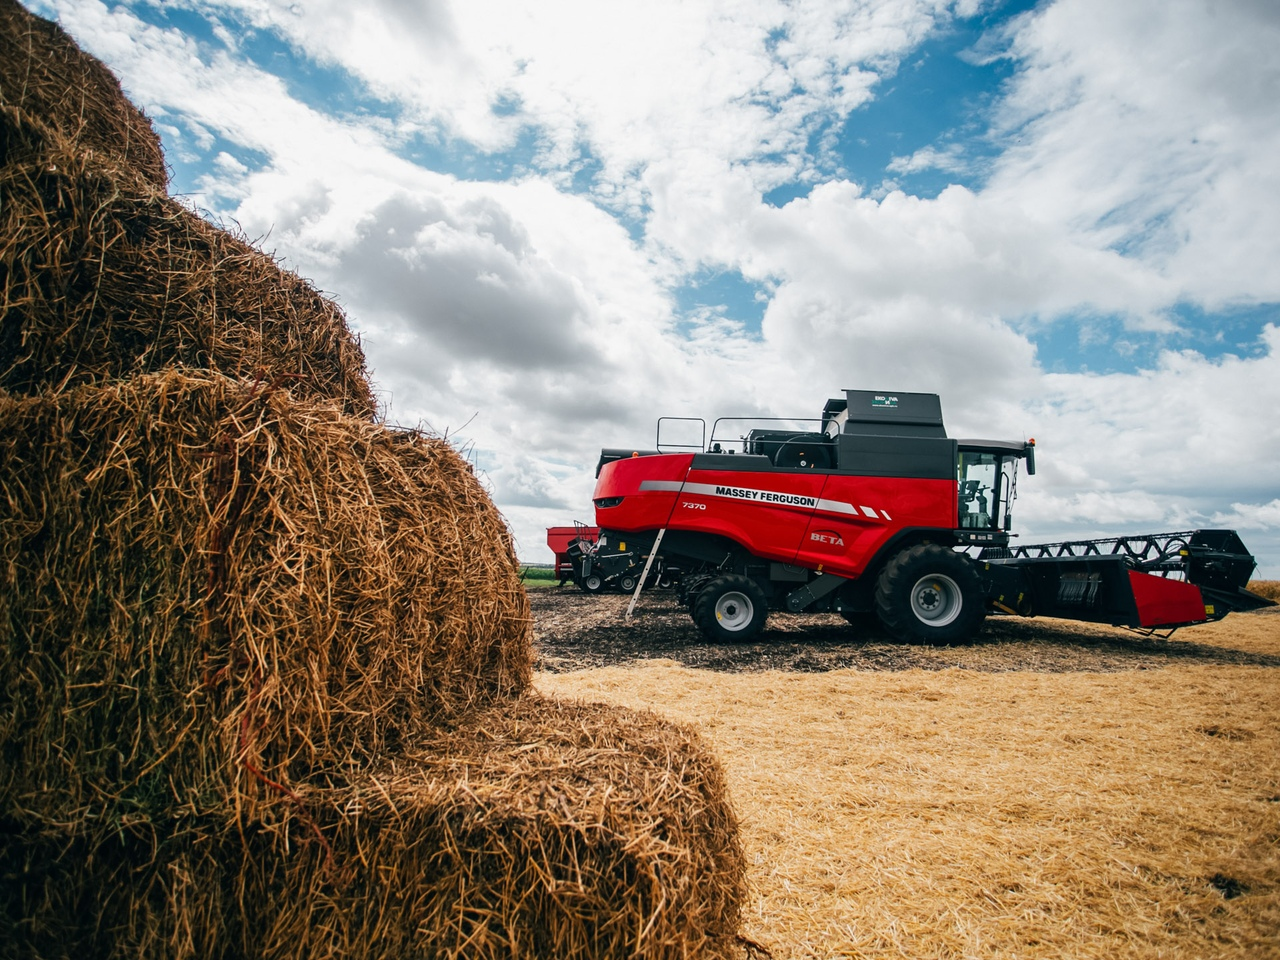 В Курской области ожидают до 5 млн тонн зерна